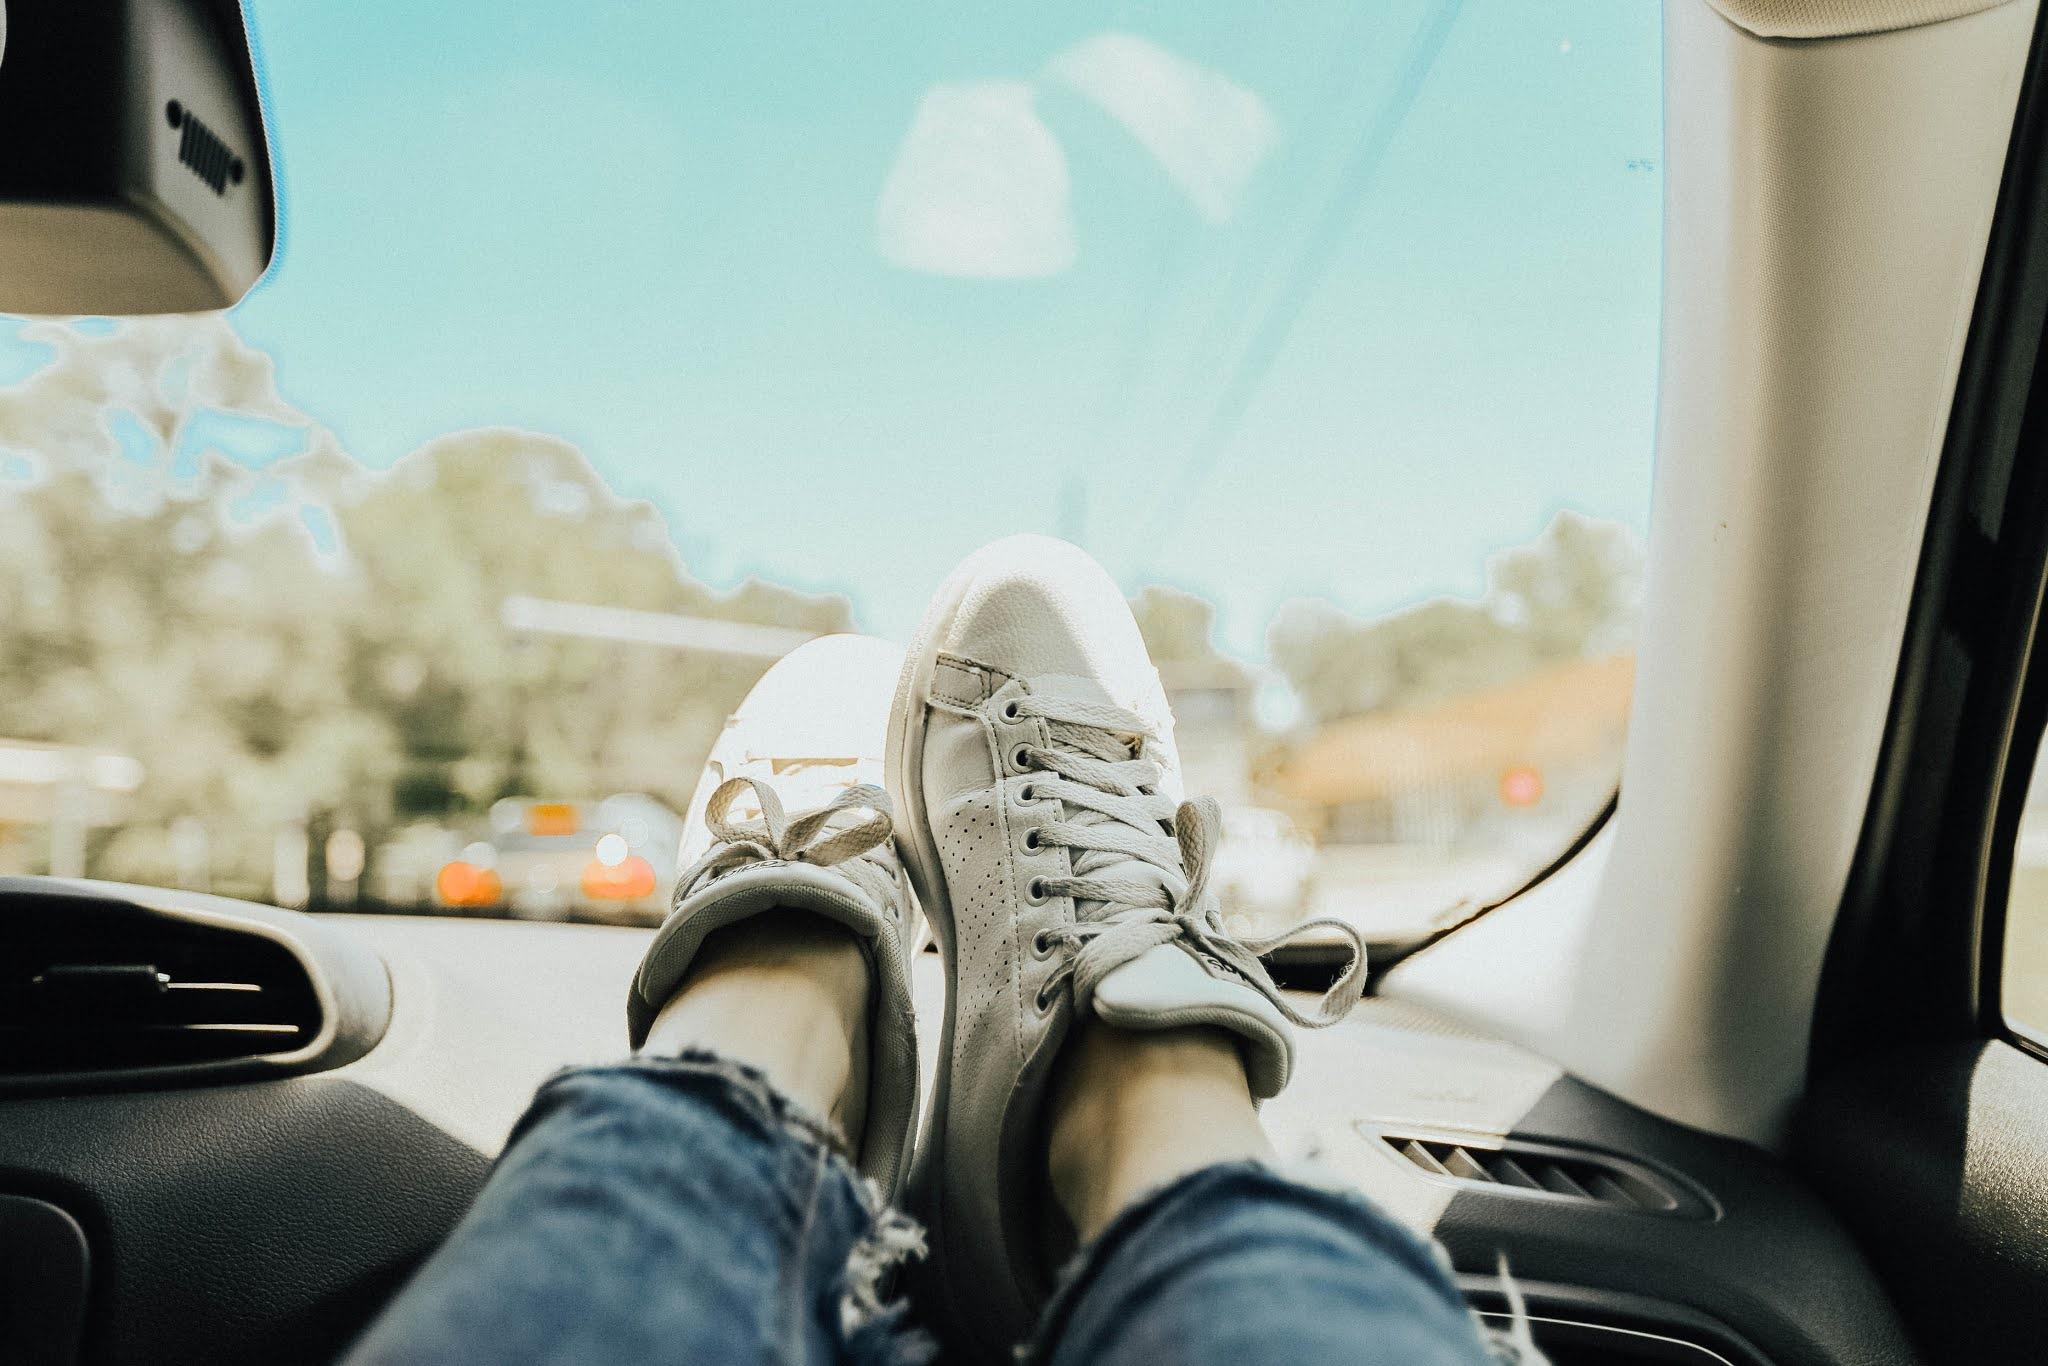 PROPER FOOTWEAR ROAD TRIP ESSENTIALS